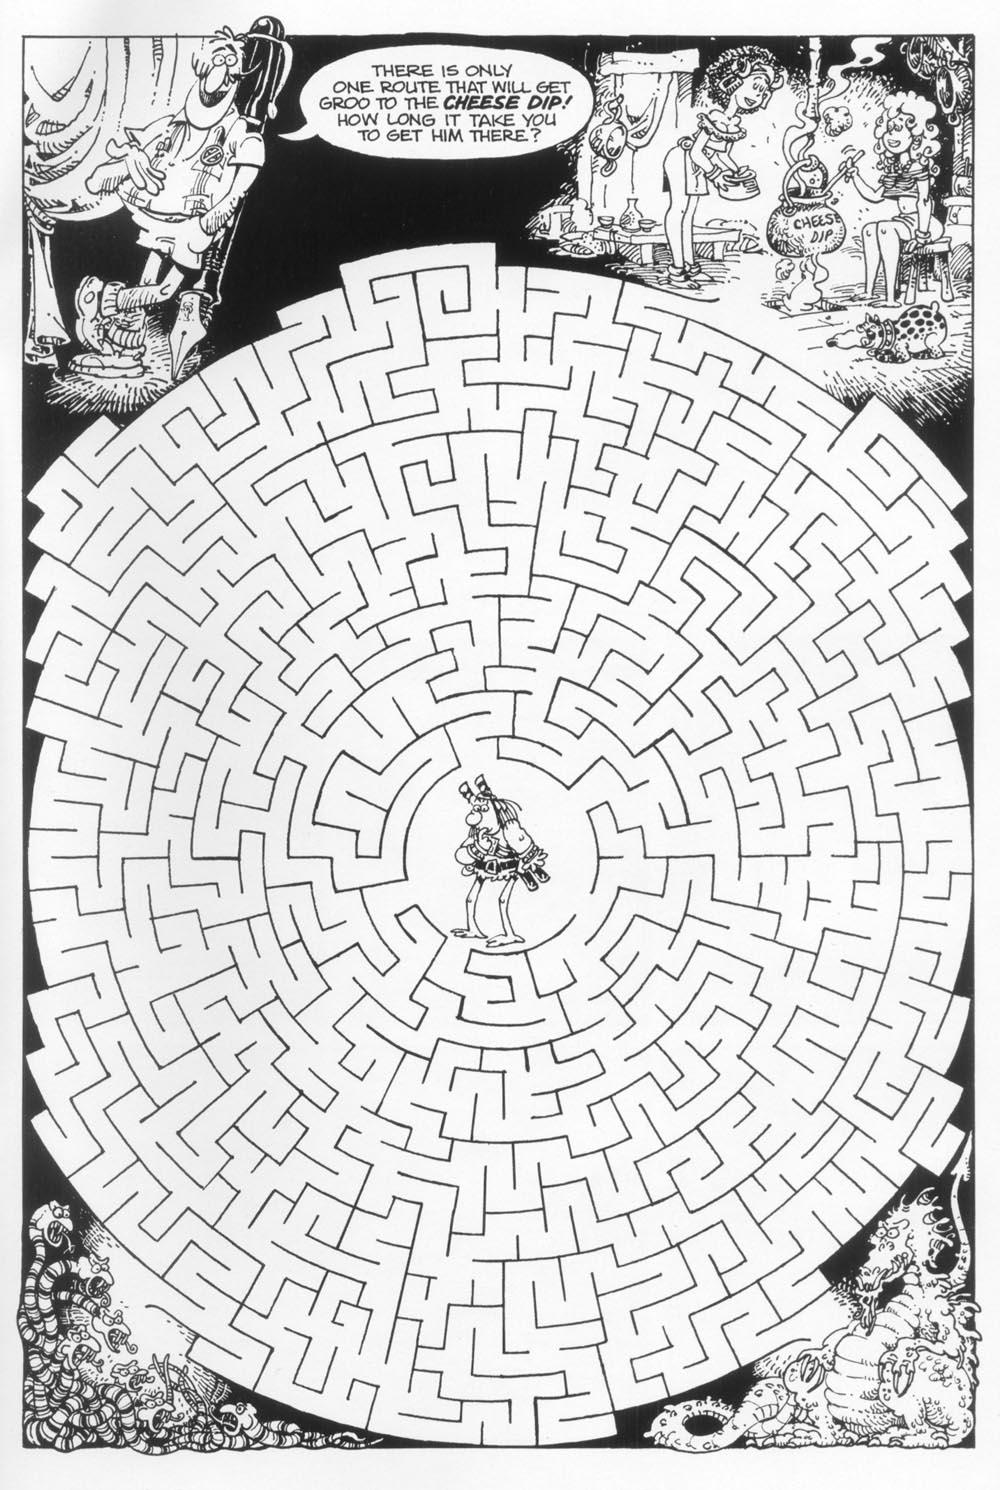 Read online Sergio Aragonés Groo the Wanderer comic -  Issue #102 - 30